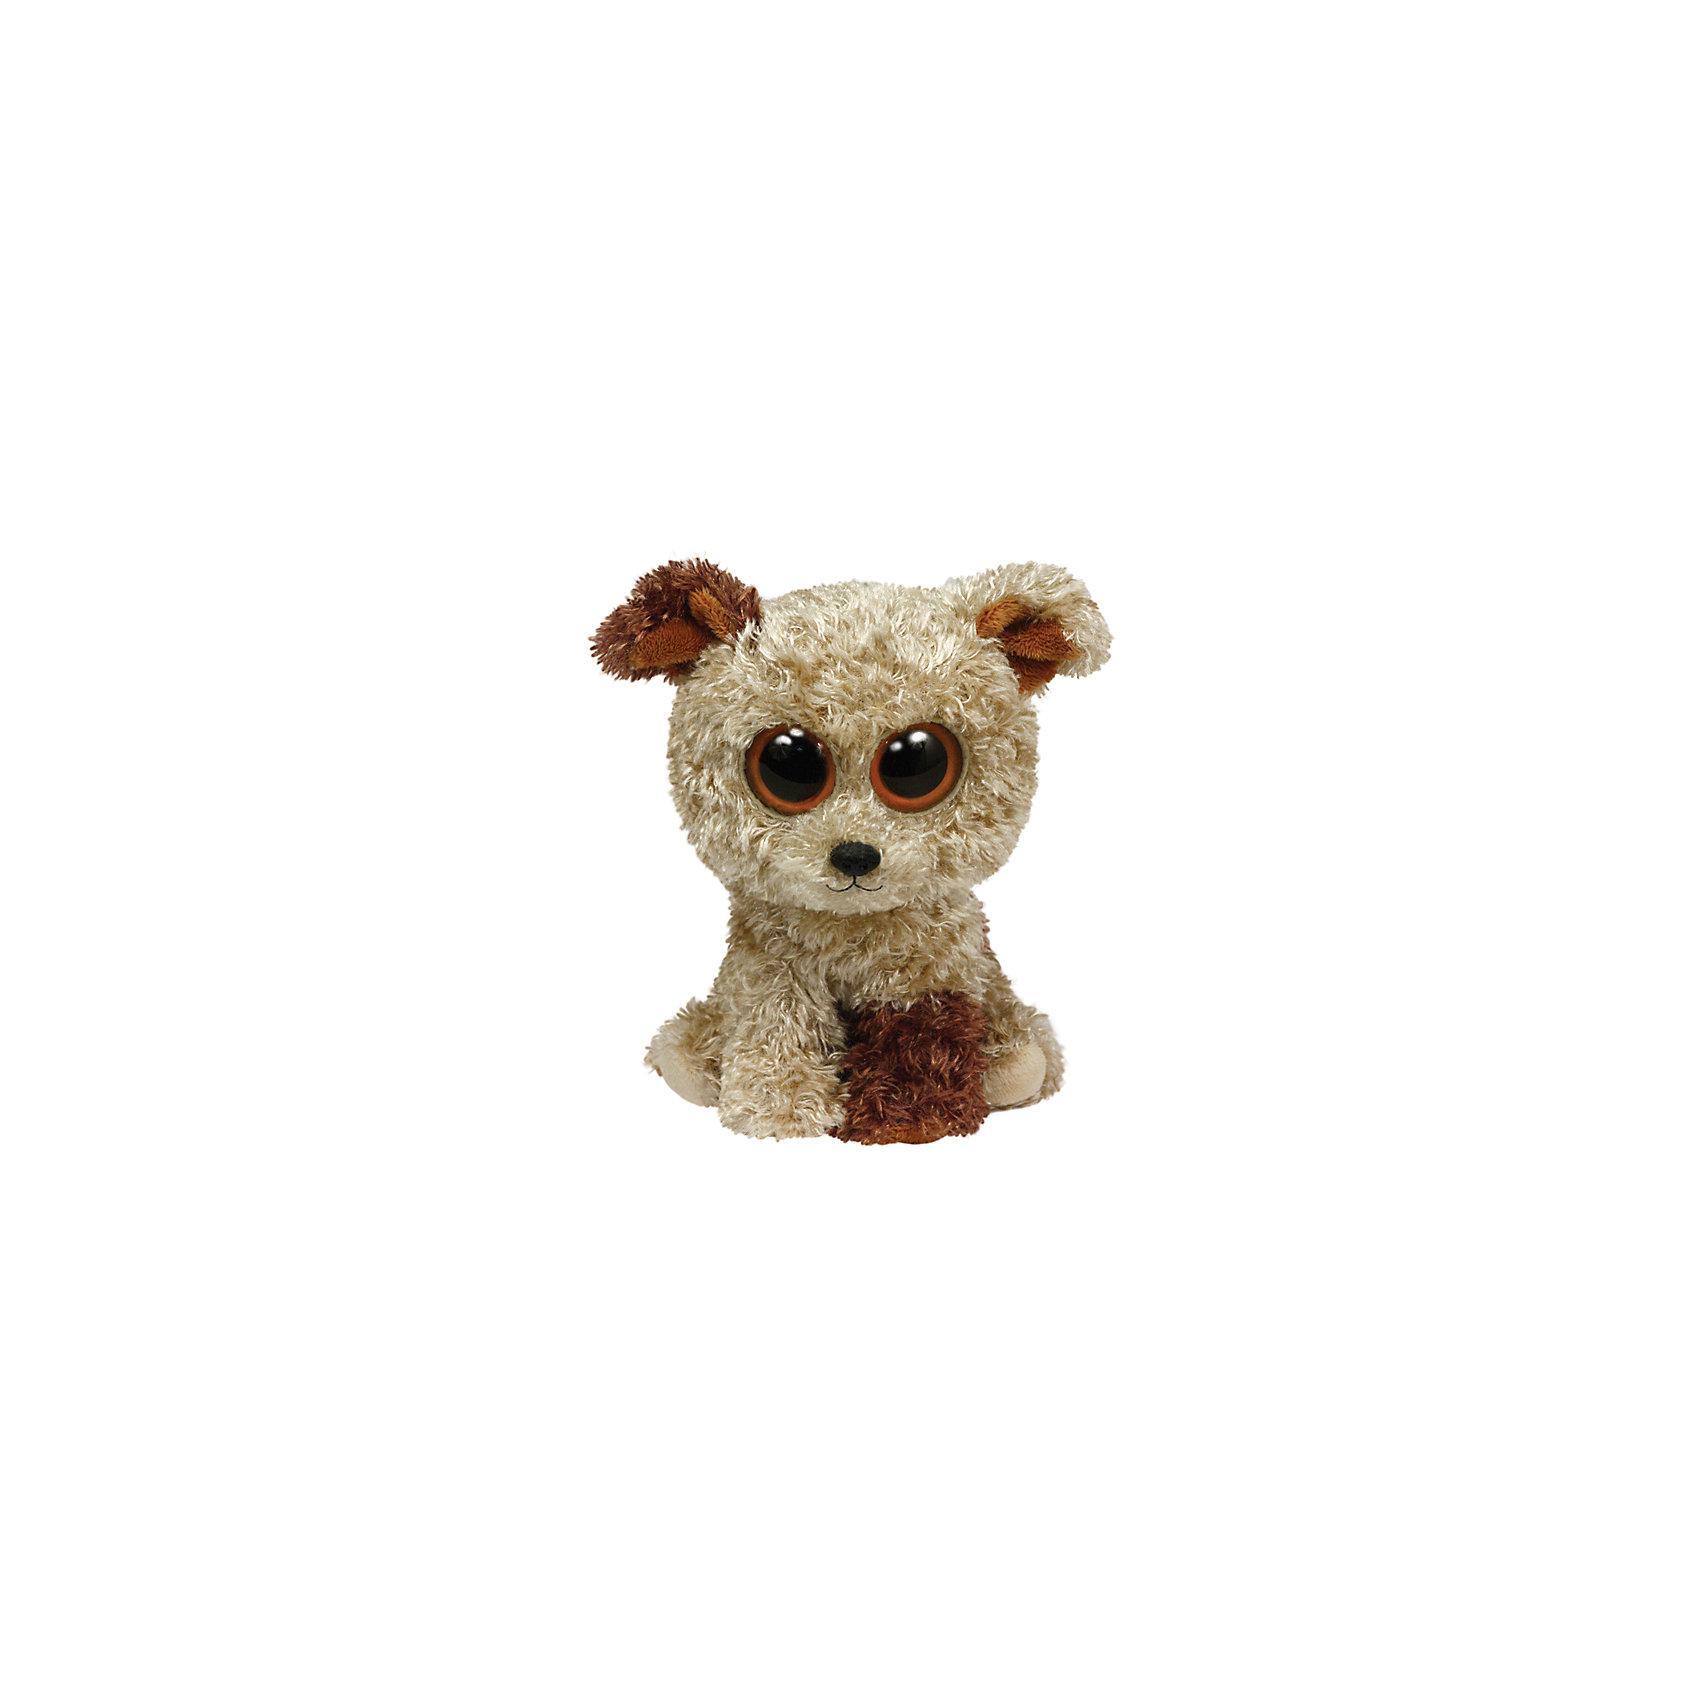 Ty Щенок Rootbeer 25 см большую мягкую игрушку собаку лежа в москве